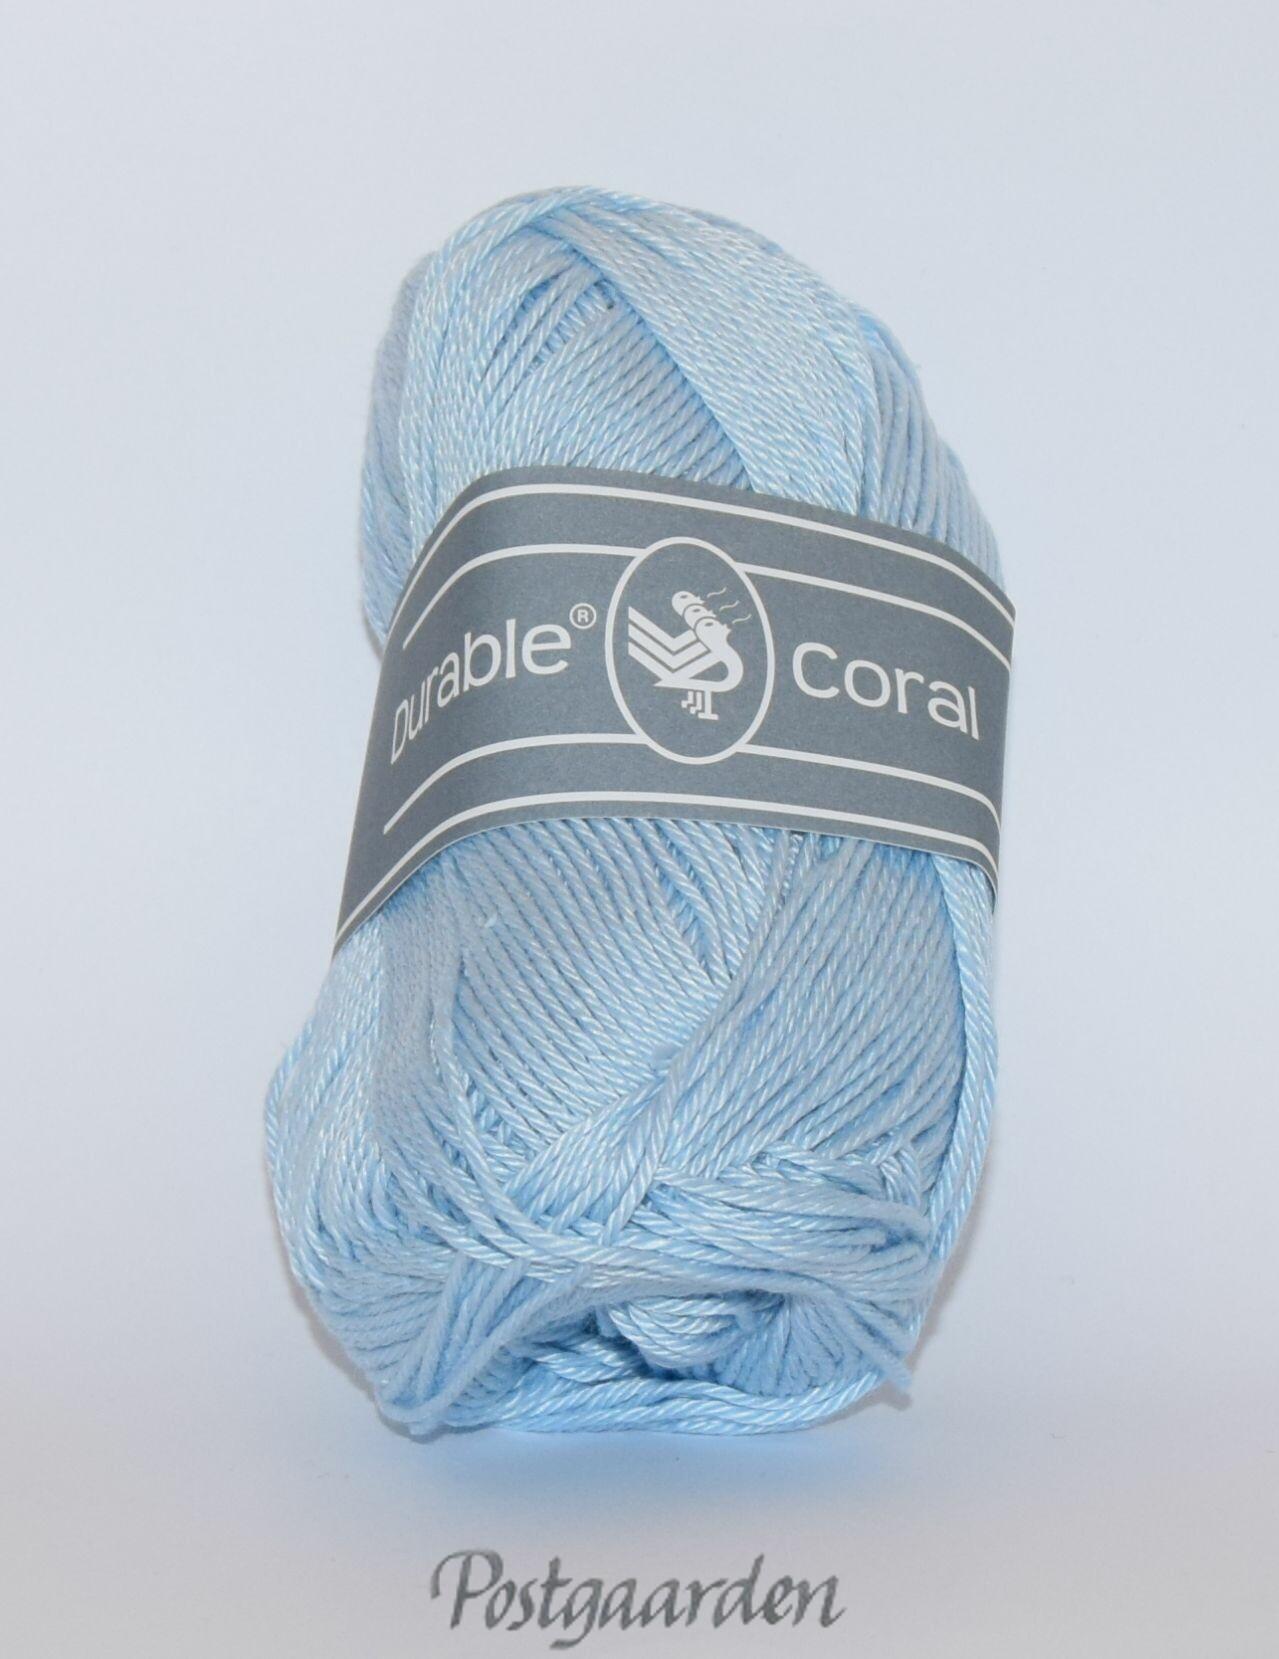 282 - Lys Blå Durable Coral Bomuldsgarn